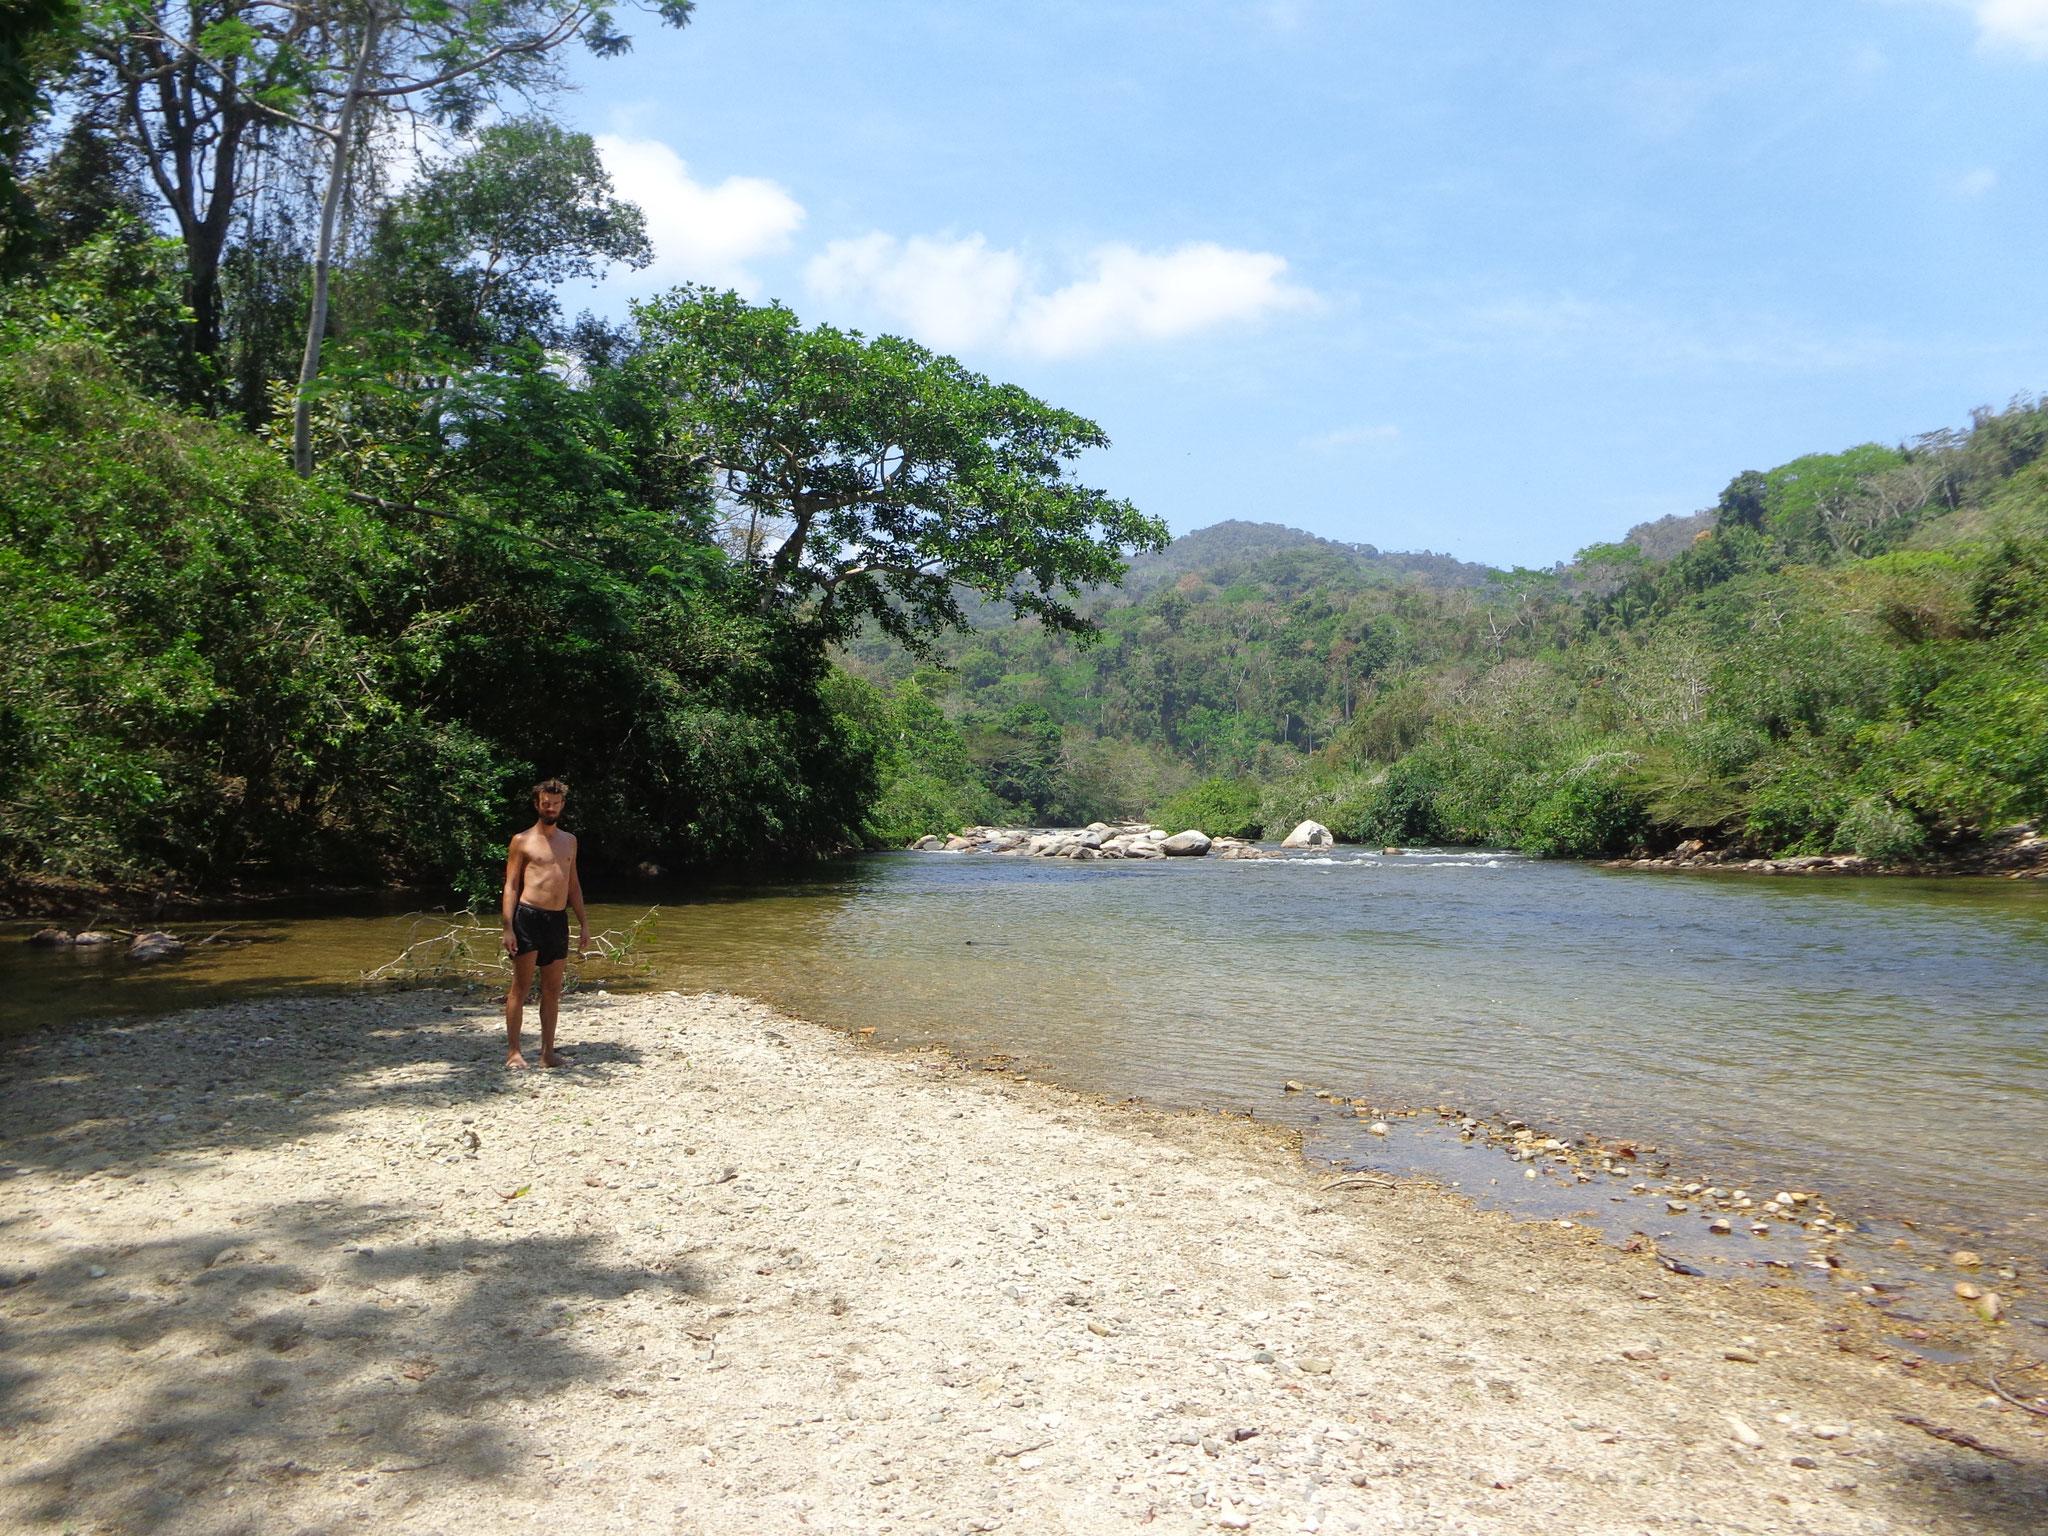 Les rios aux eaux rafraichissantes